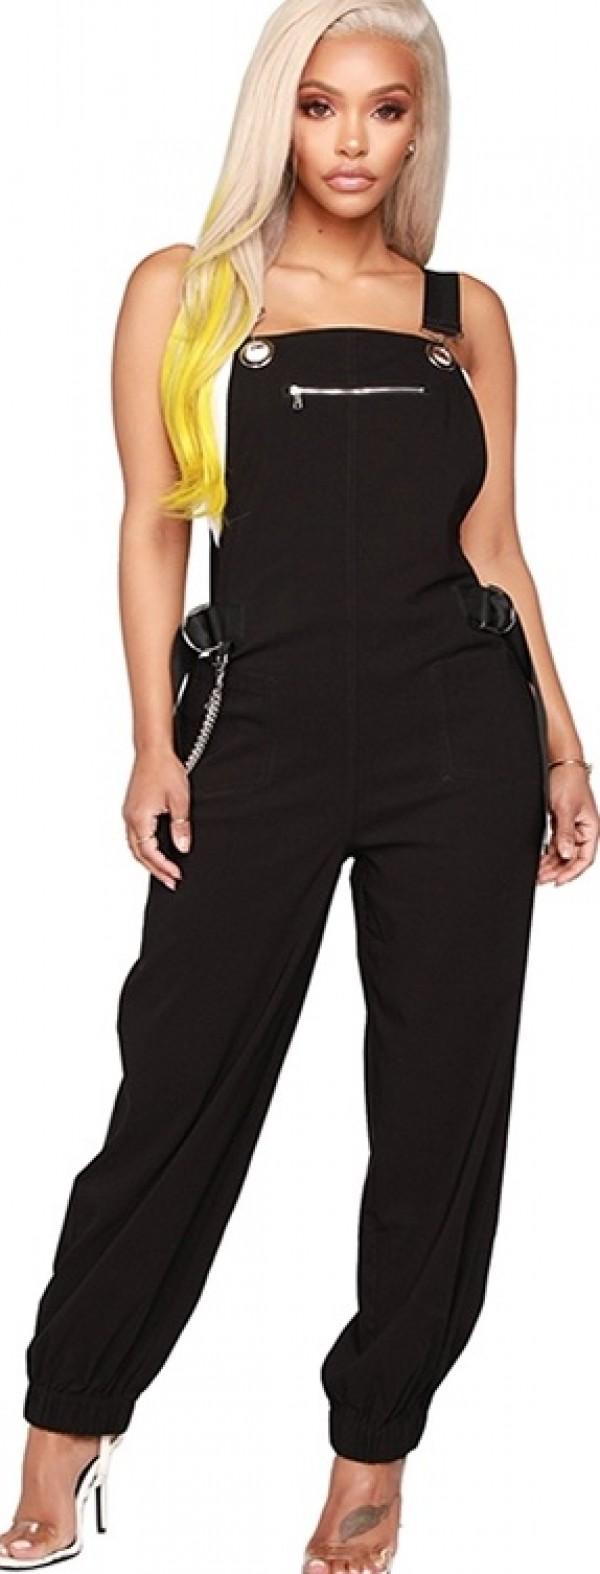 brand new 010eb 5b2d7 Tute Eleganti, Jumpsuit with Manzara - Recensione makeup e ...